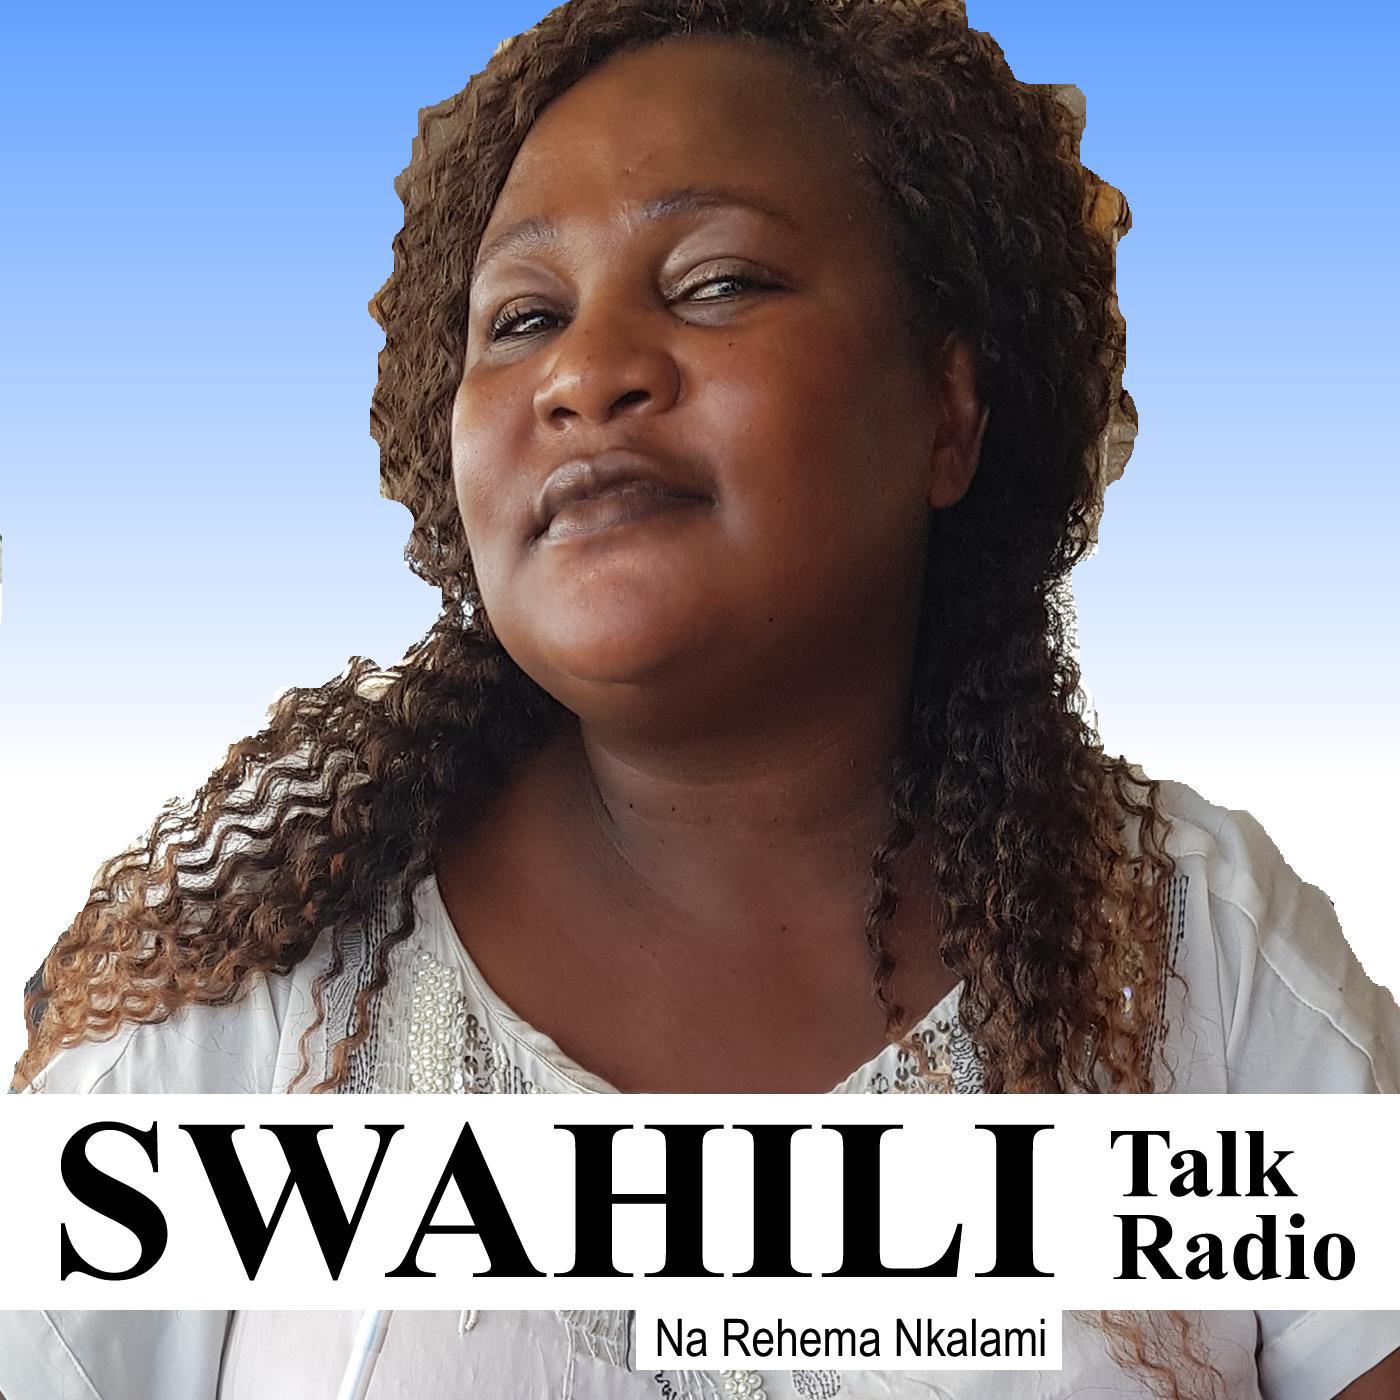 Swahili Talk Radio Podcast show art